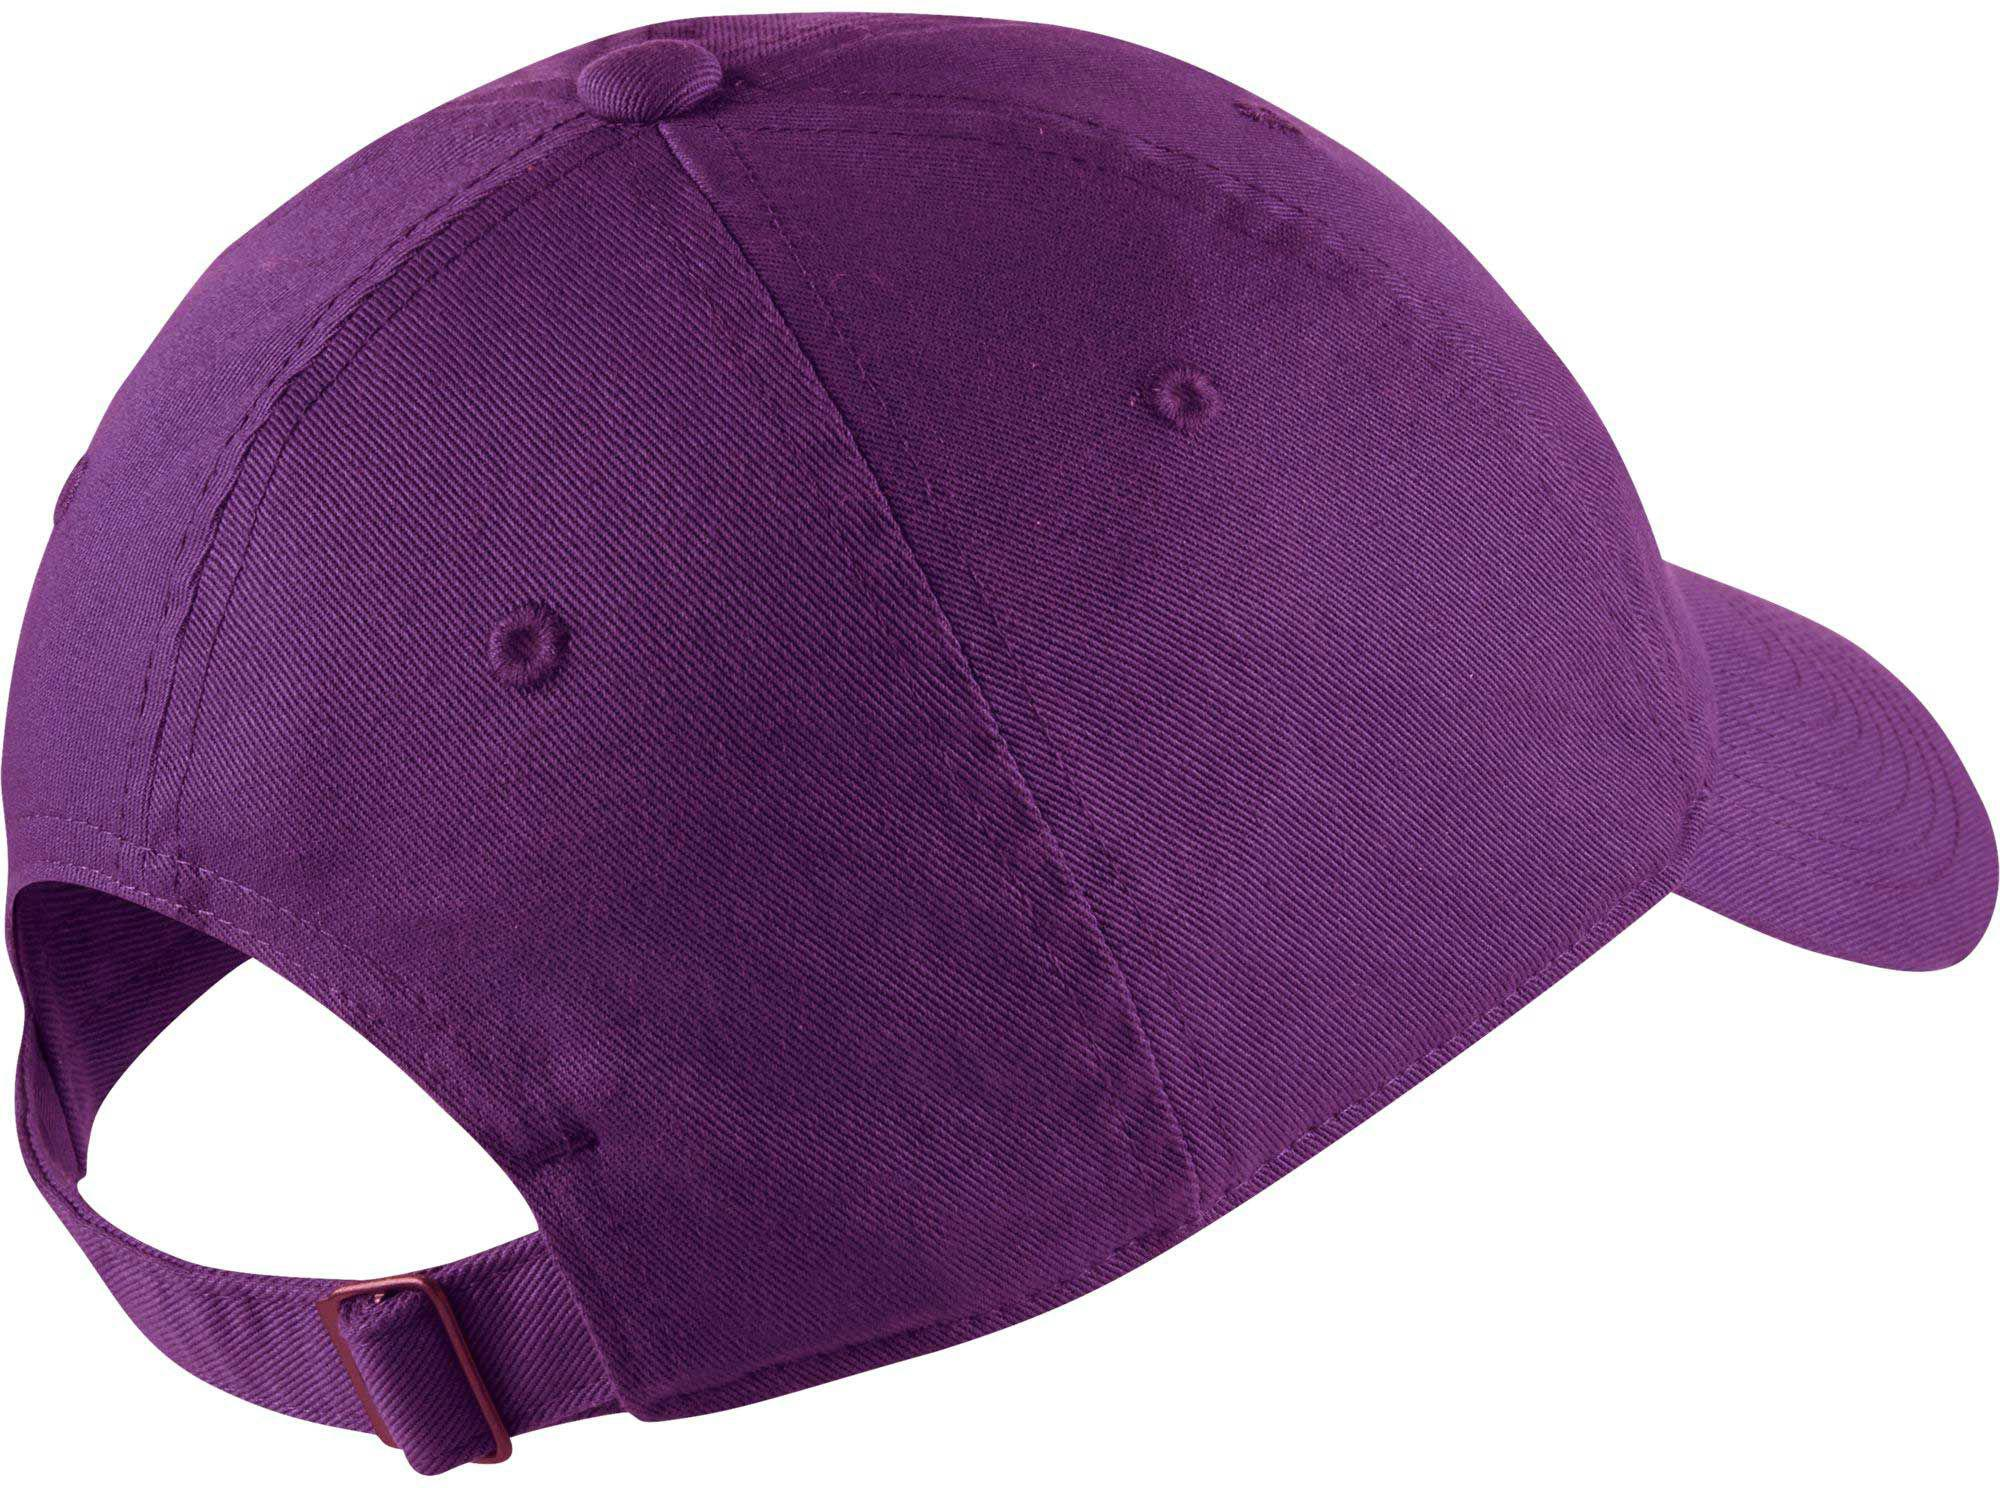 size 40 588b8 608c4 Lyst - Nike Twill H86 Adjustable Hat in Purple